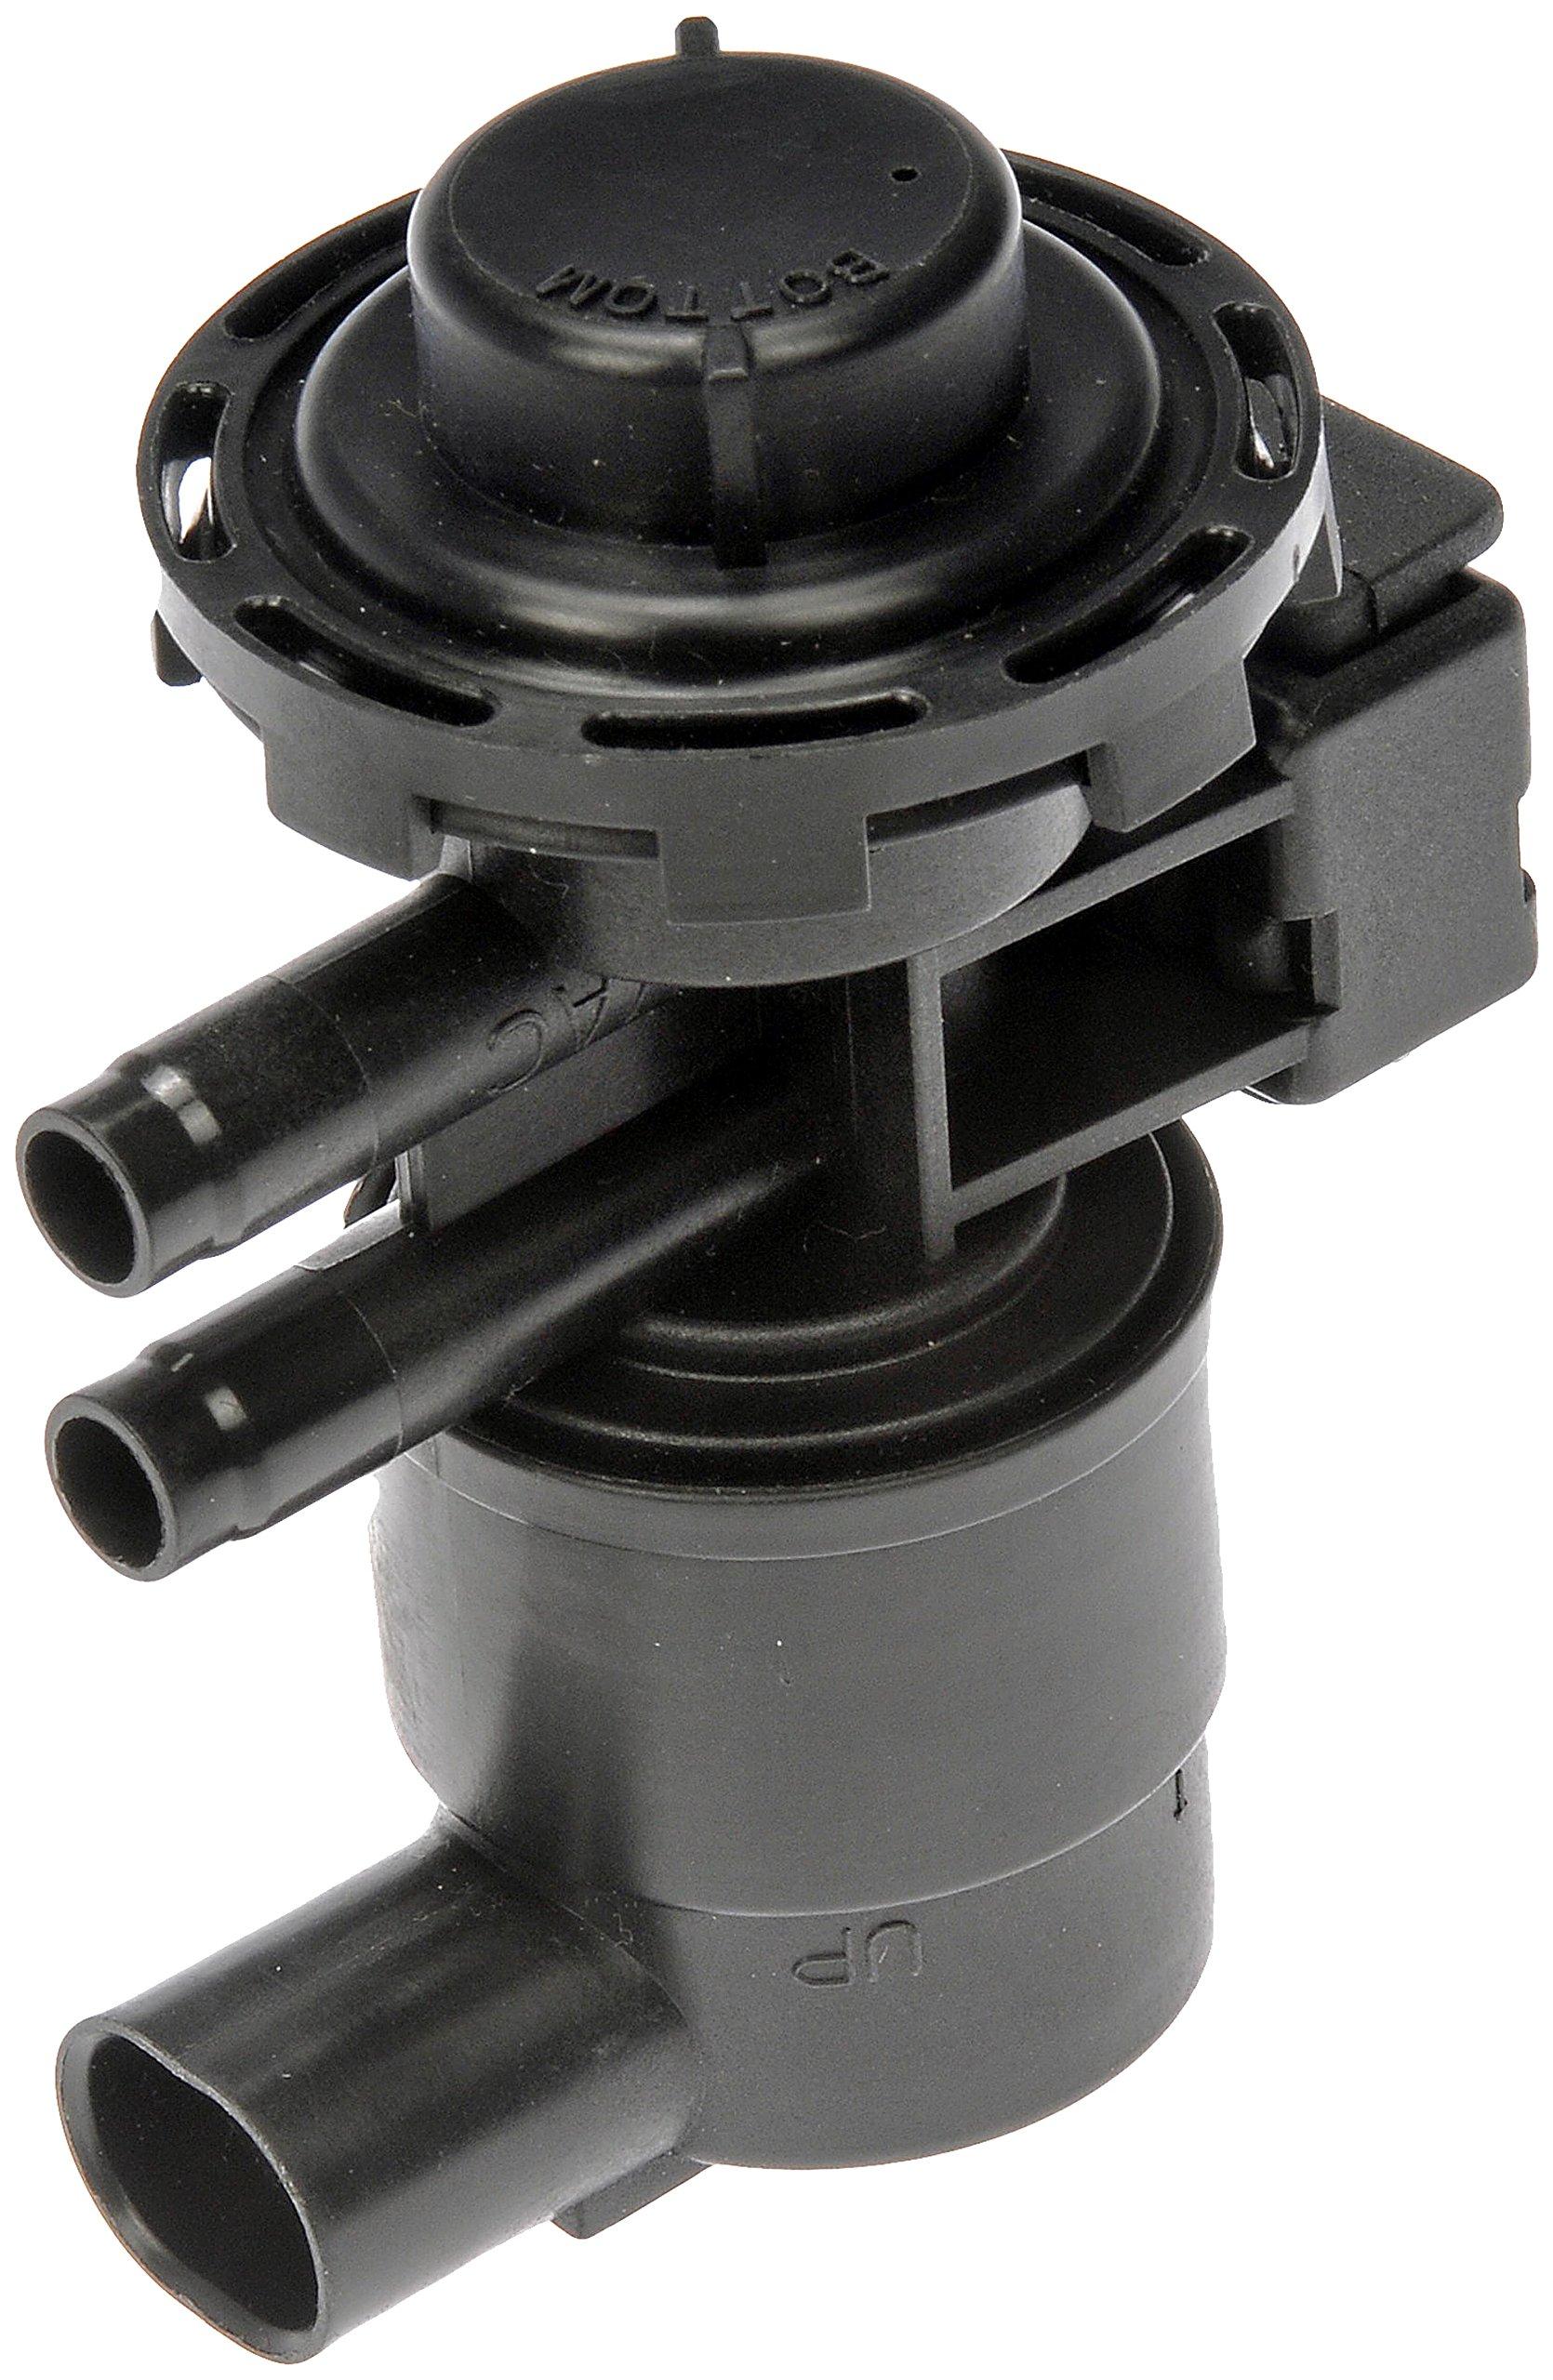 APDTY 022914 Evaporative Emissions Fuel Vapor Canister Purge Vent Valve Solenoid